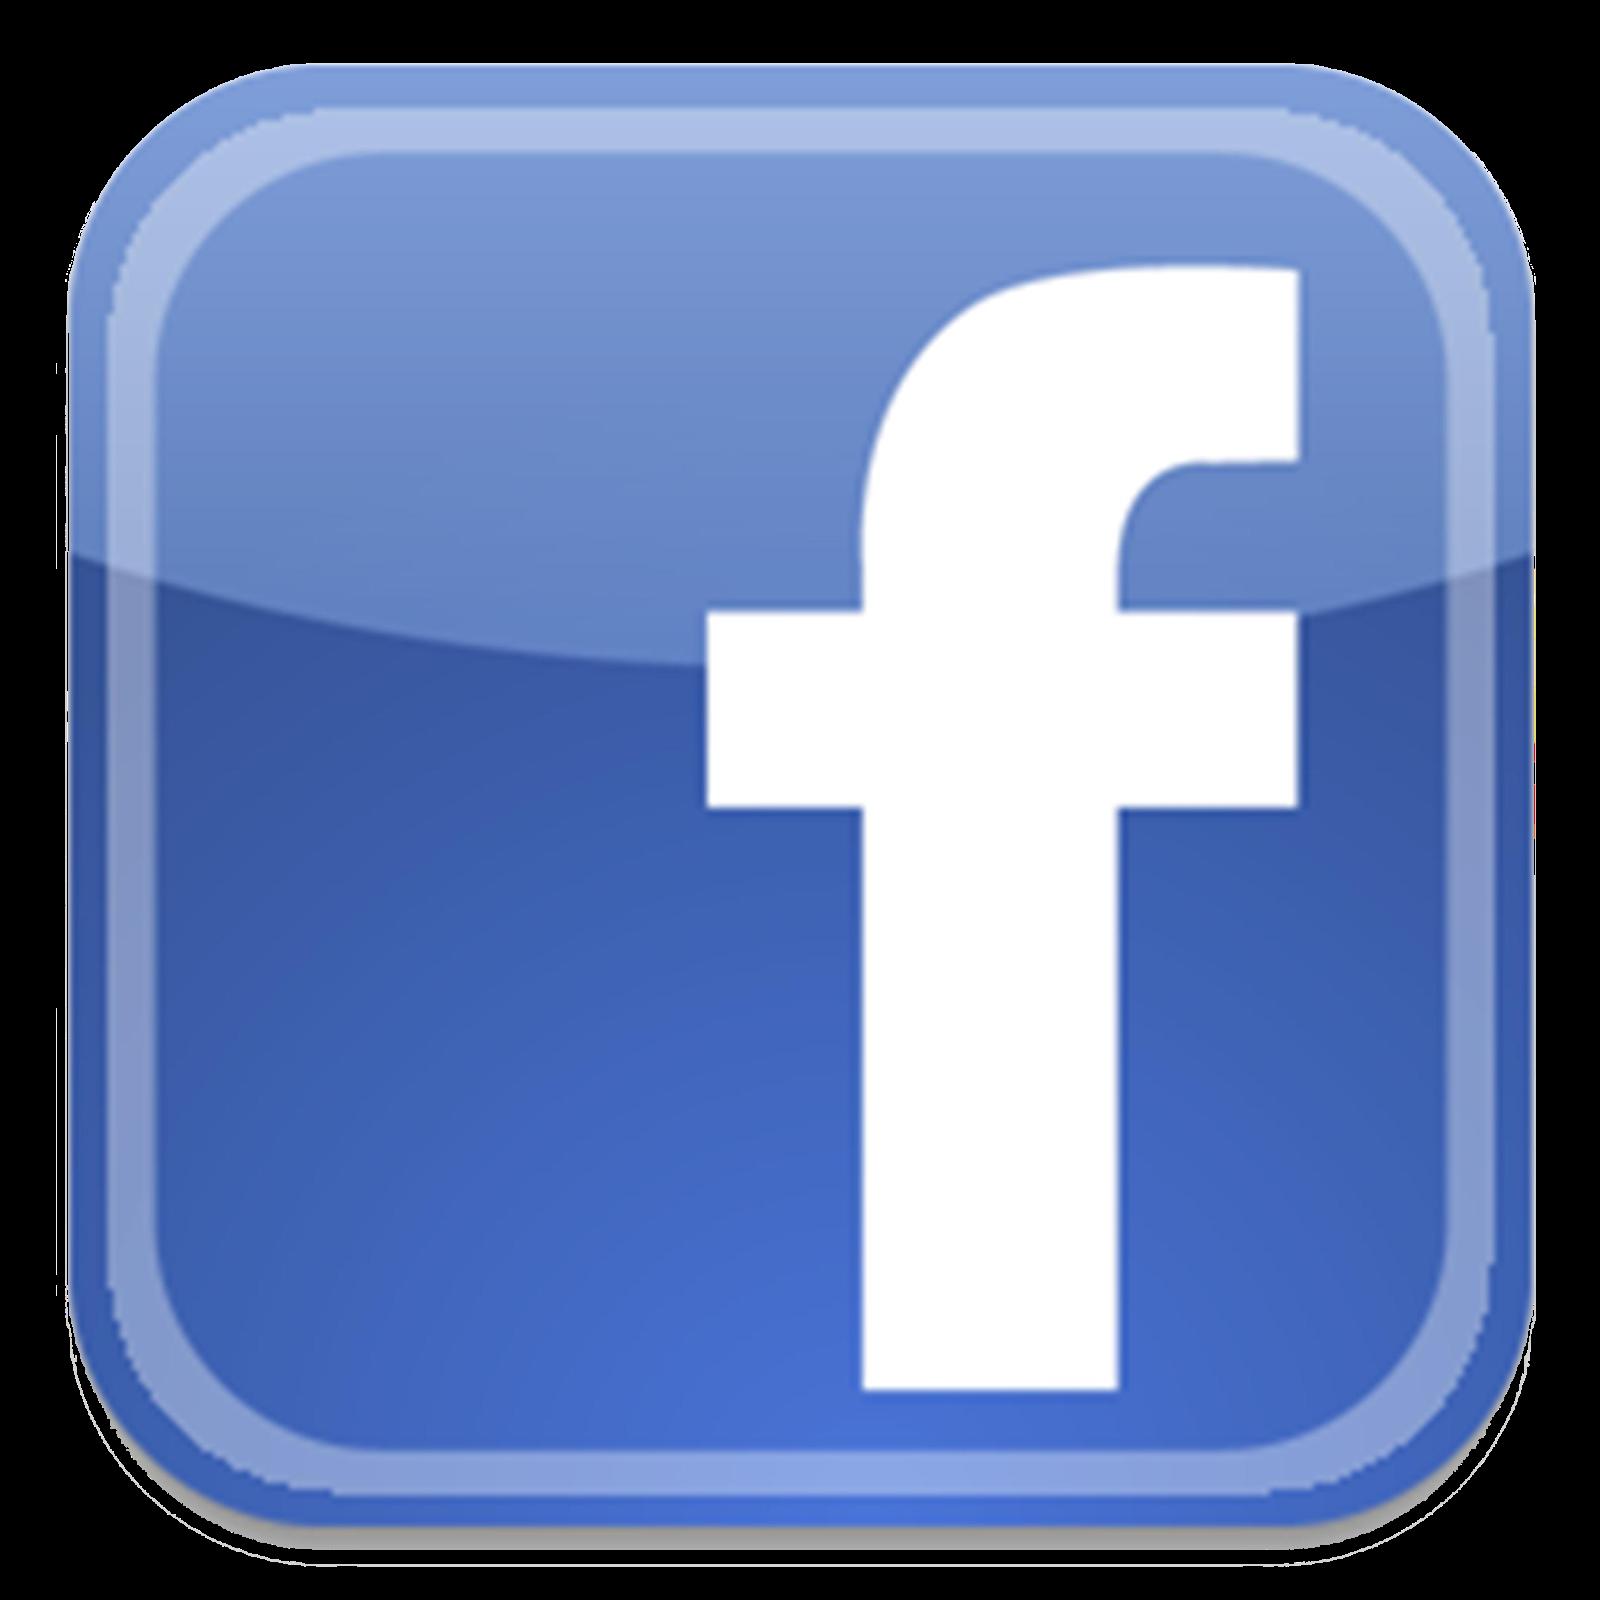 facebook logo png 483